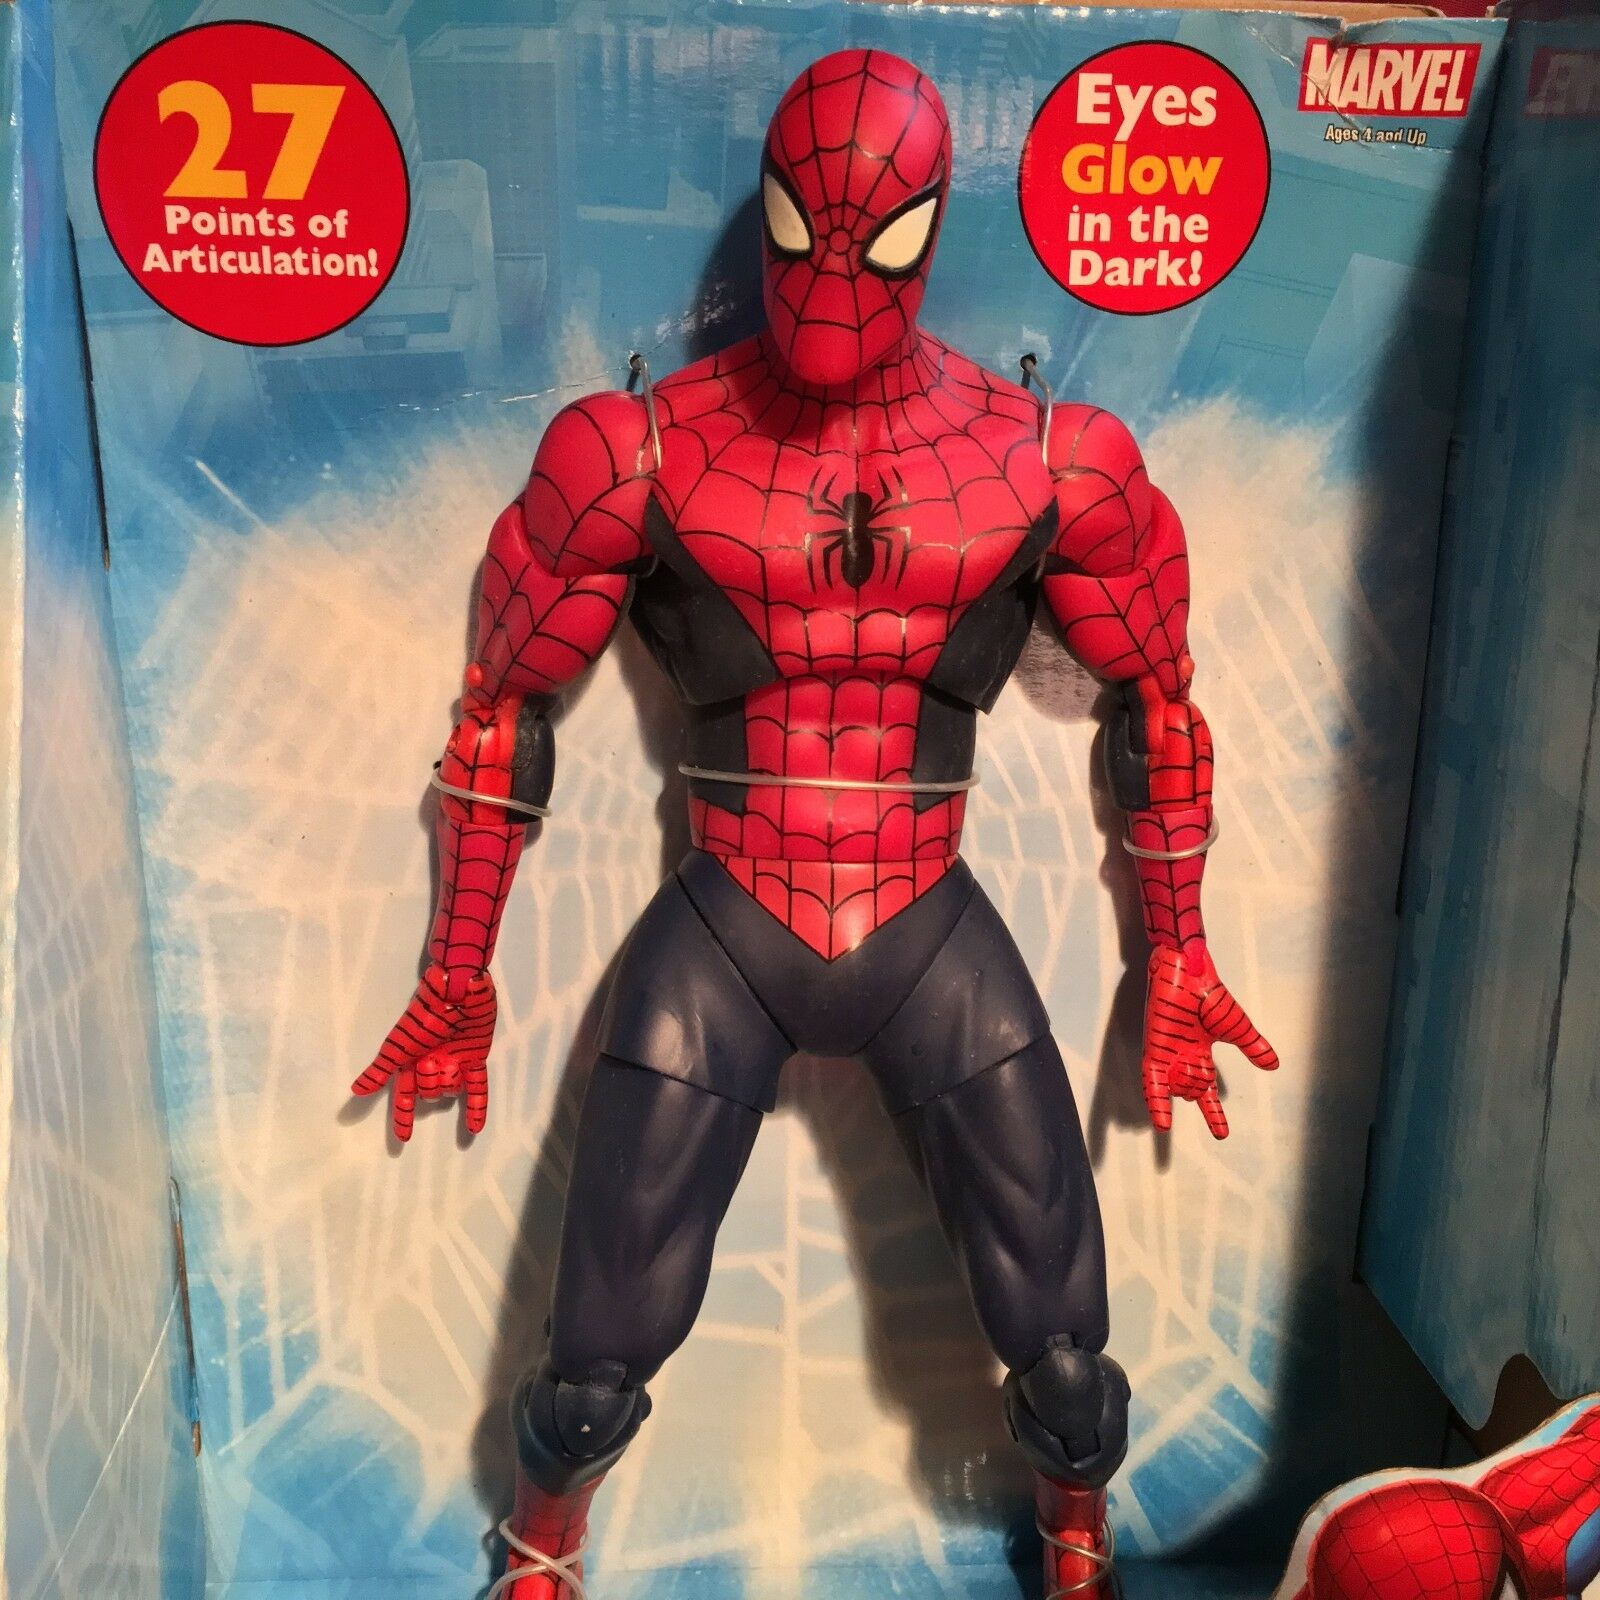 ToyBiz 12  POSEABLE THE AMAZING SPIDER-MAN FIGURE DARK SUIT 27 POA MARVEL ICONS